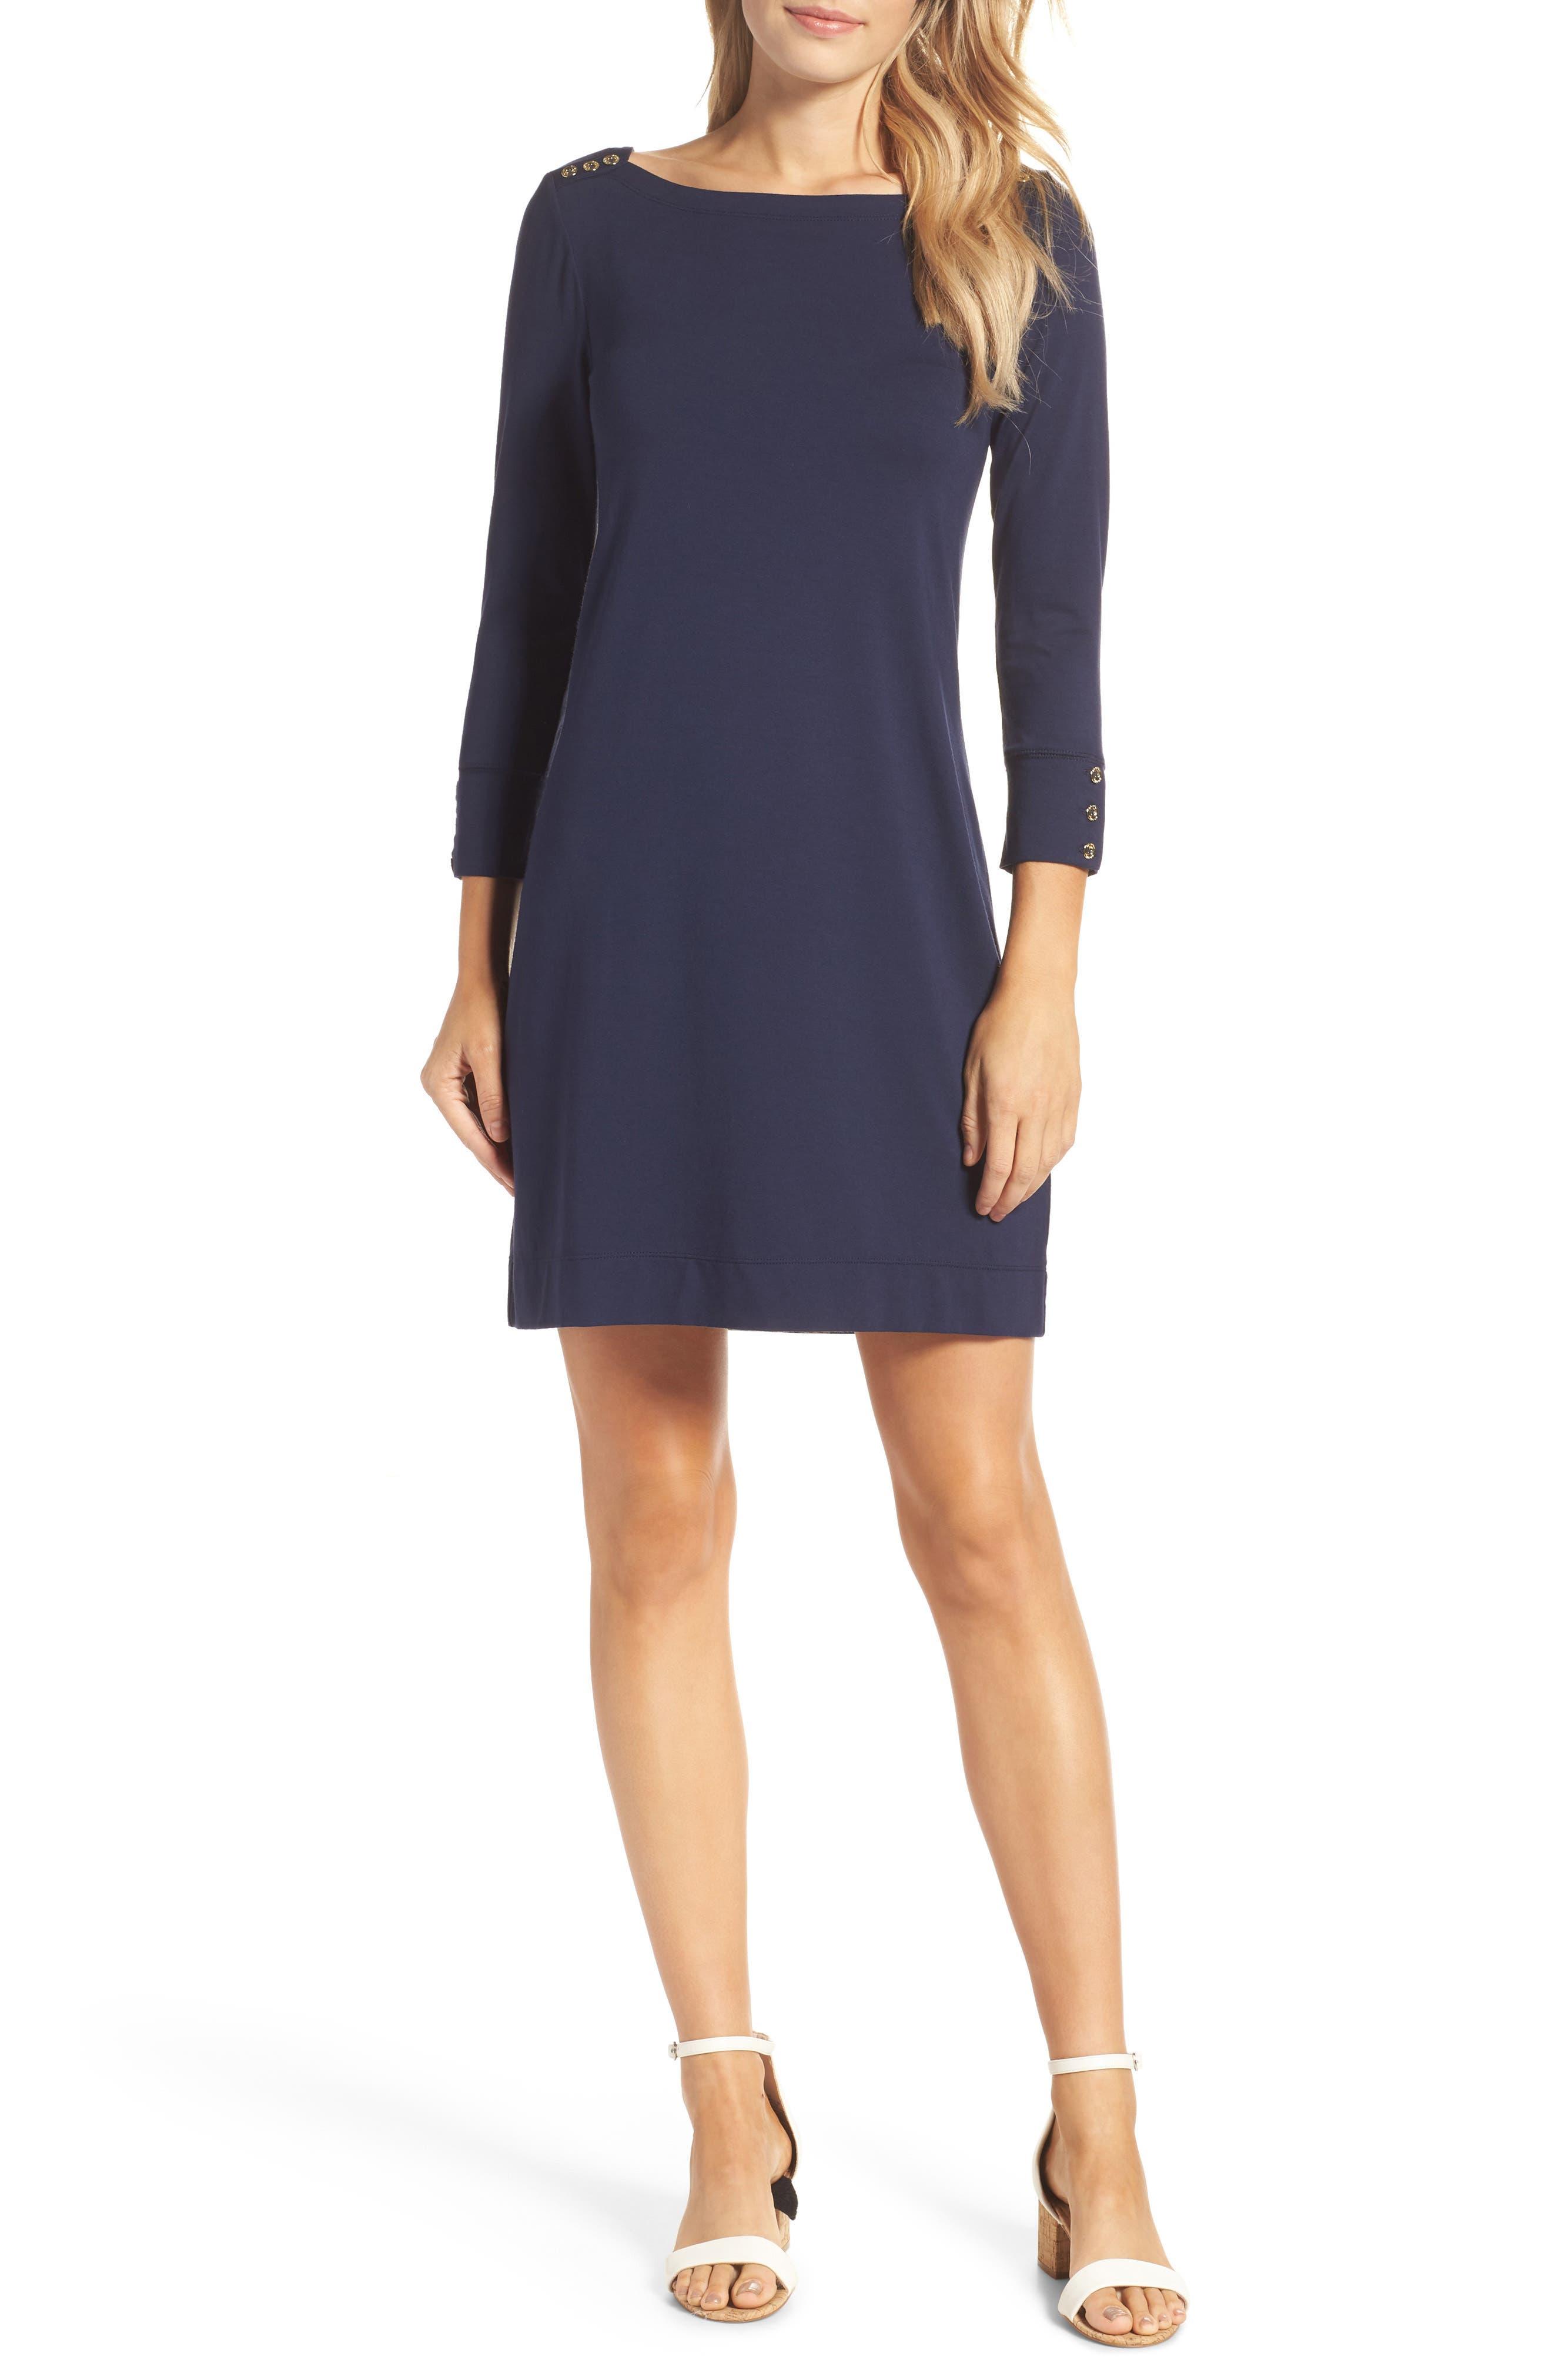 Sophie UPF 50+ Dress,                             Main thumbnail 1, color,                             True Navy